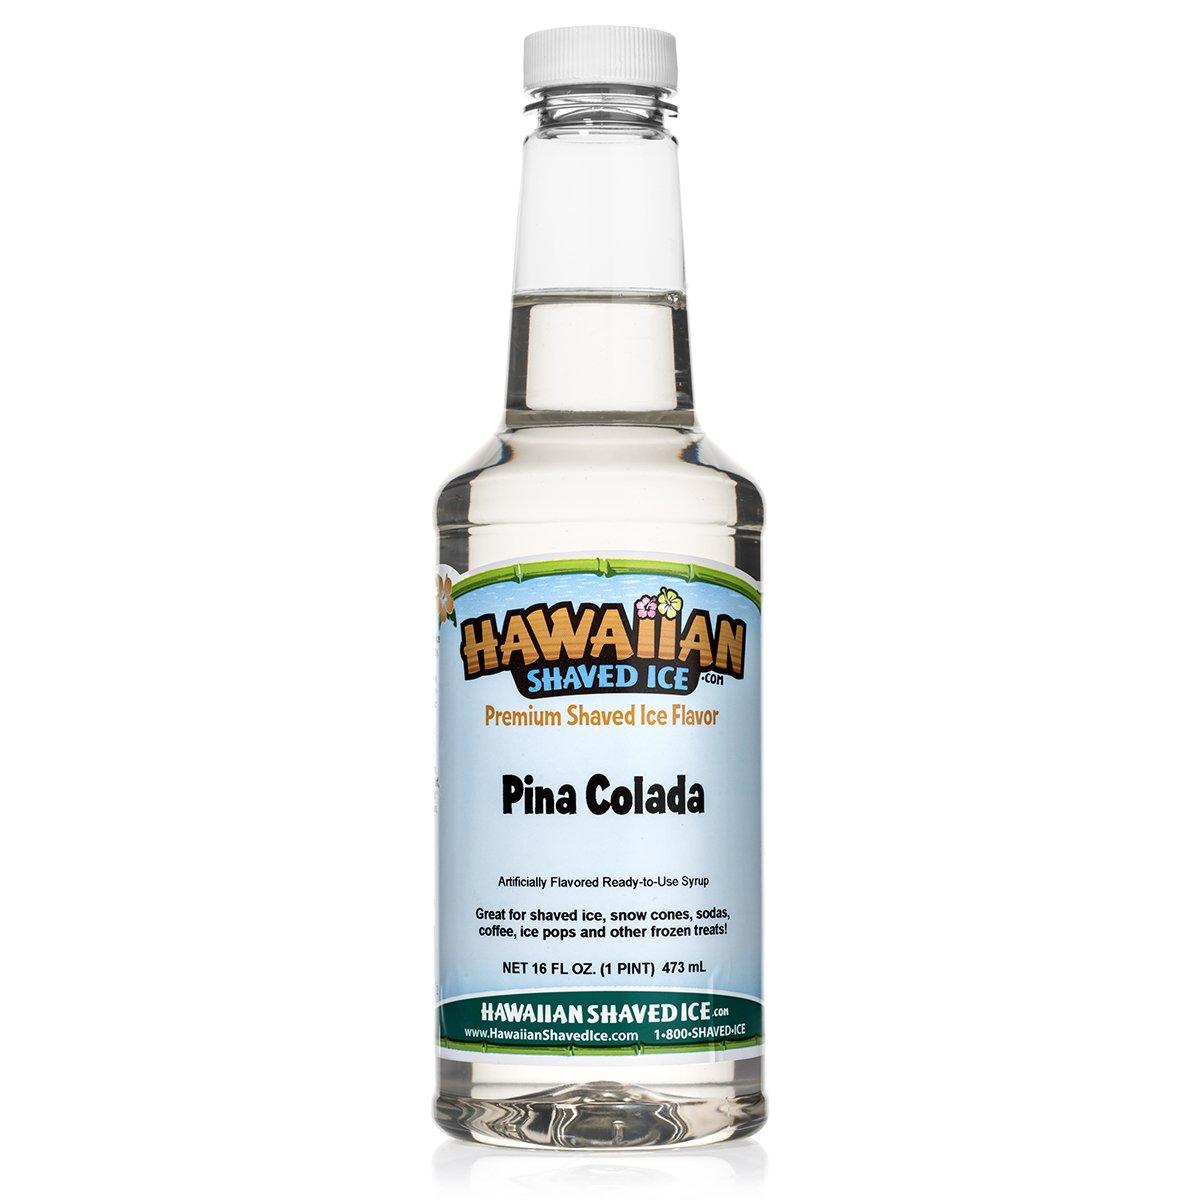 Hawaiian Shaved Ice Syrup, Pina Colada, Pint